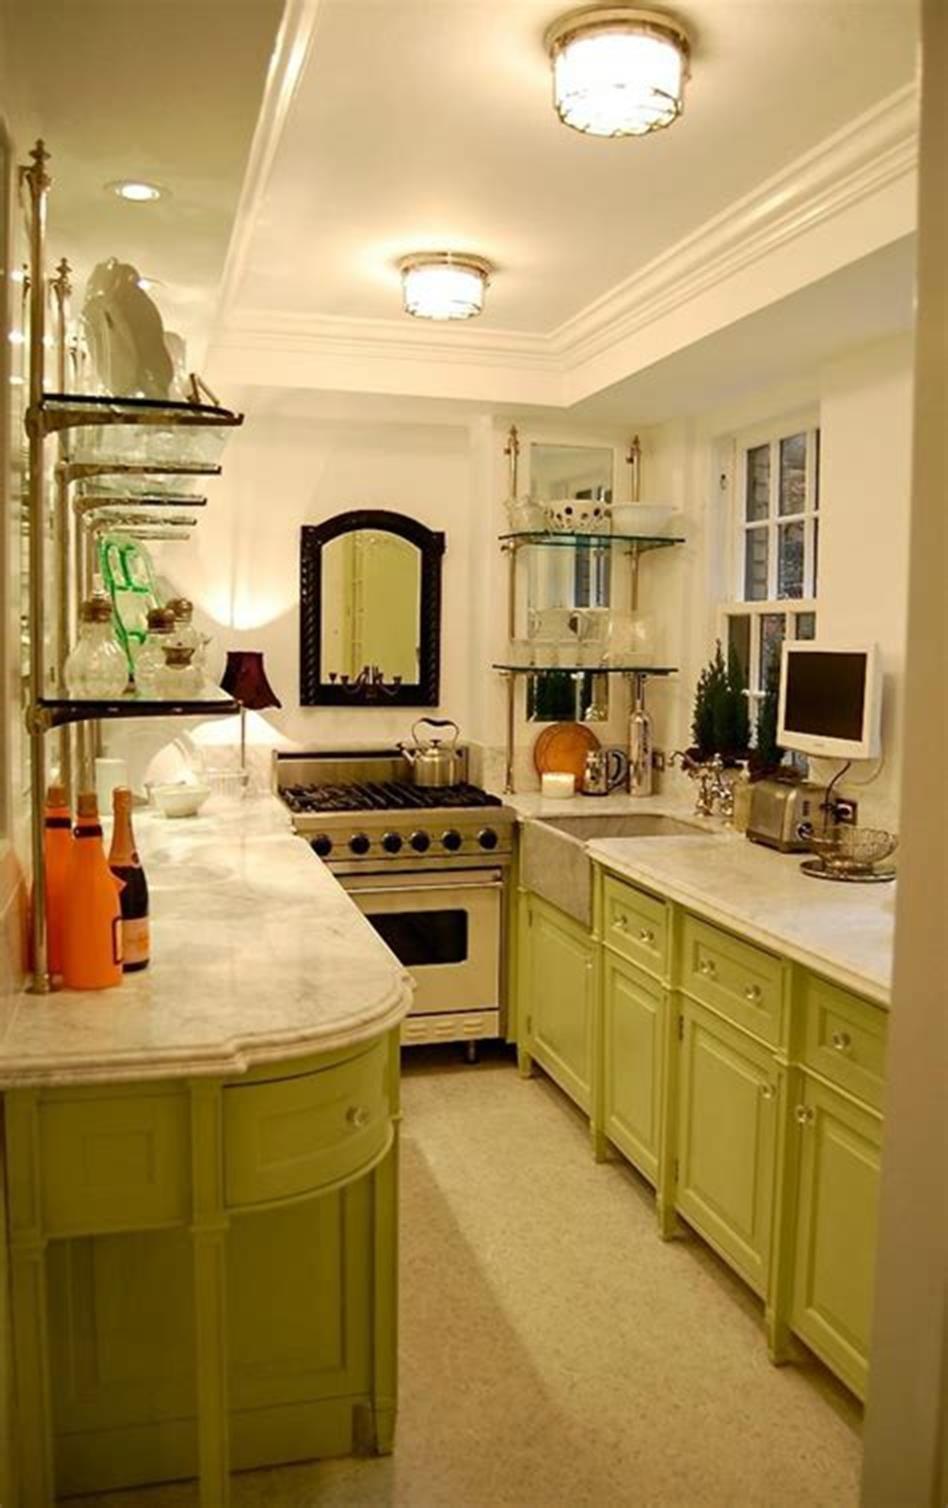 46 amazing ideas kitchen design trends 2019 33 in 2019 galley kitchen design galley kitchen on kitchen decor trends id=59710